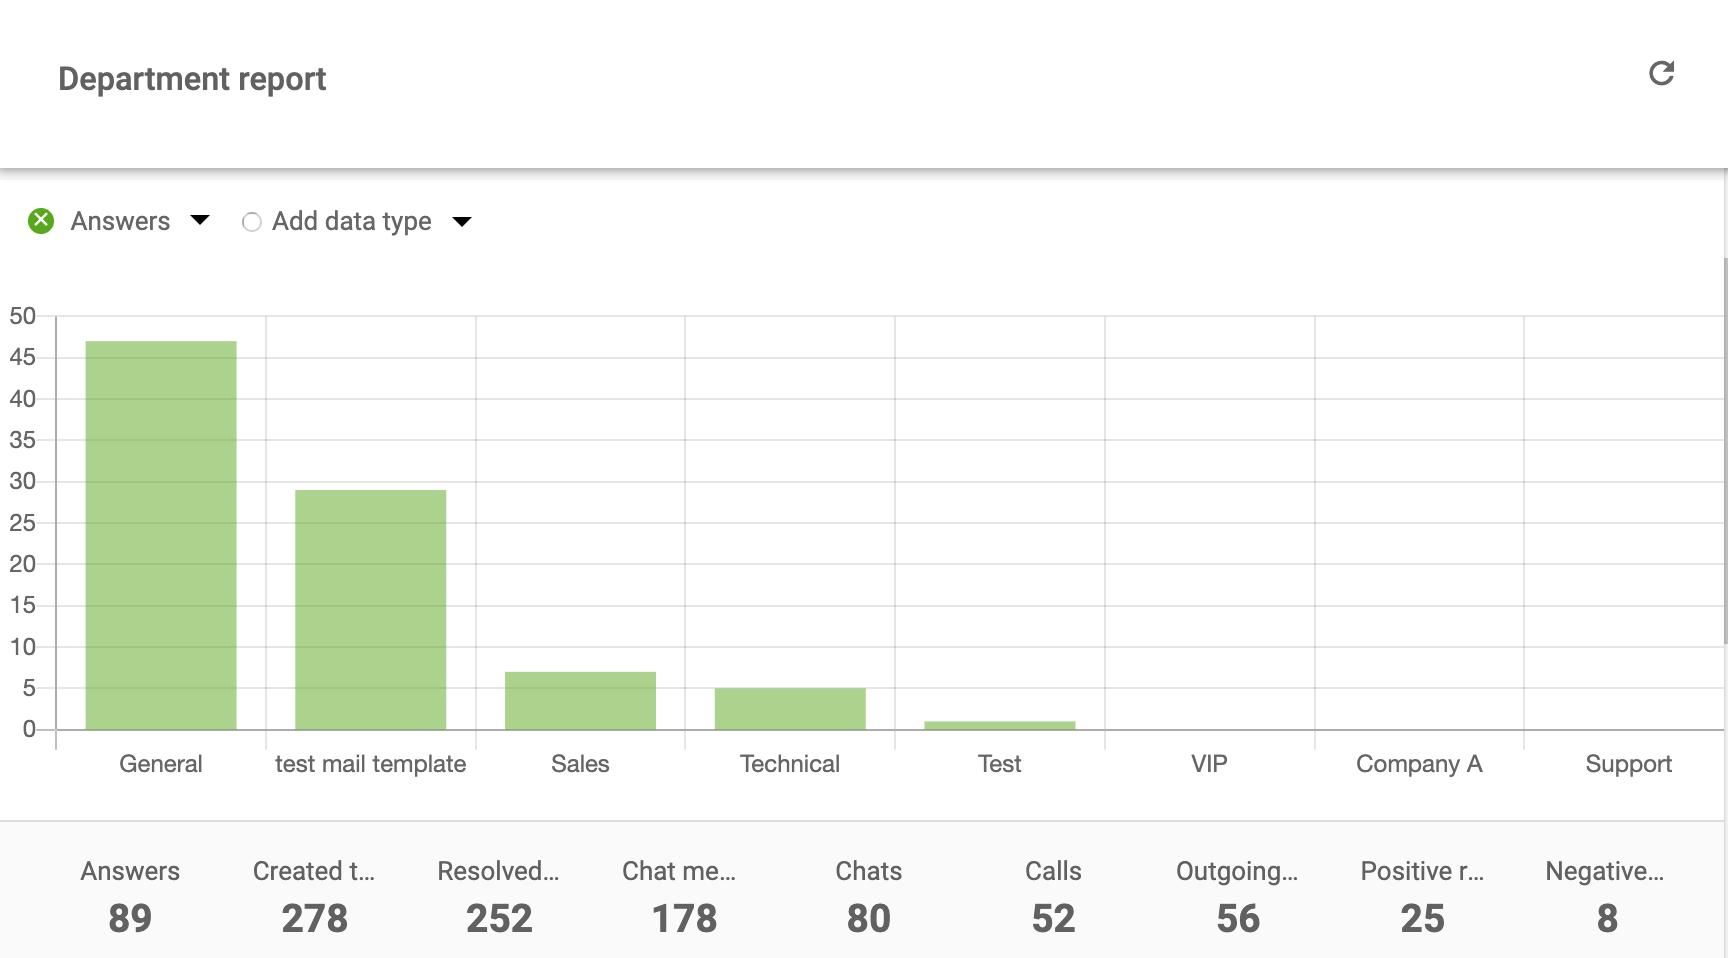 customer-reports-department-report-LiveAgent